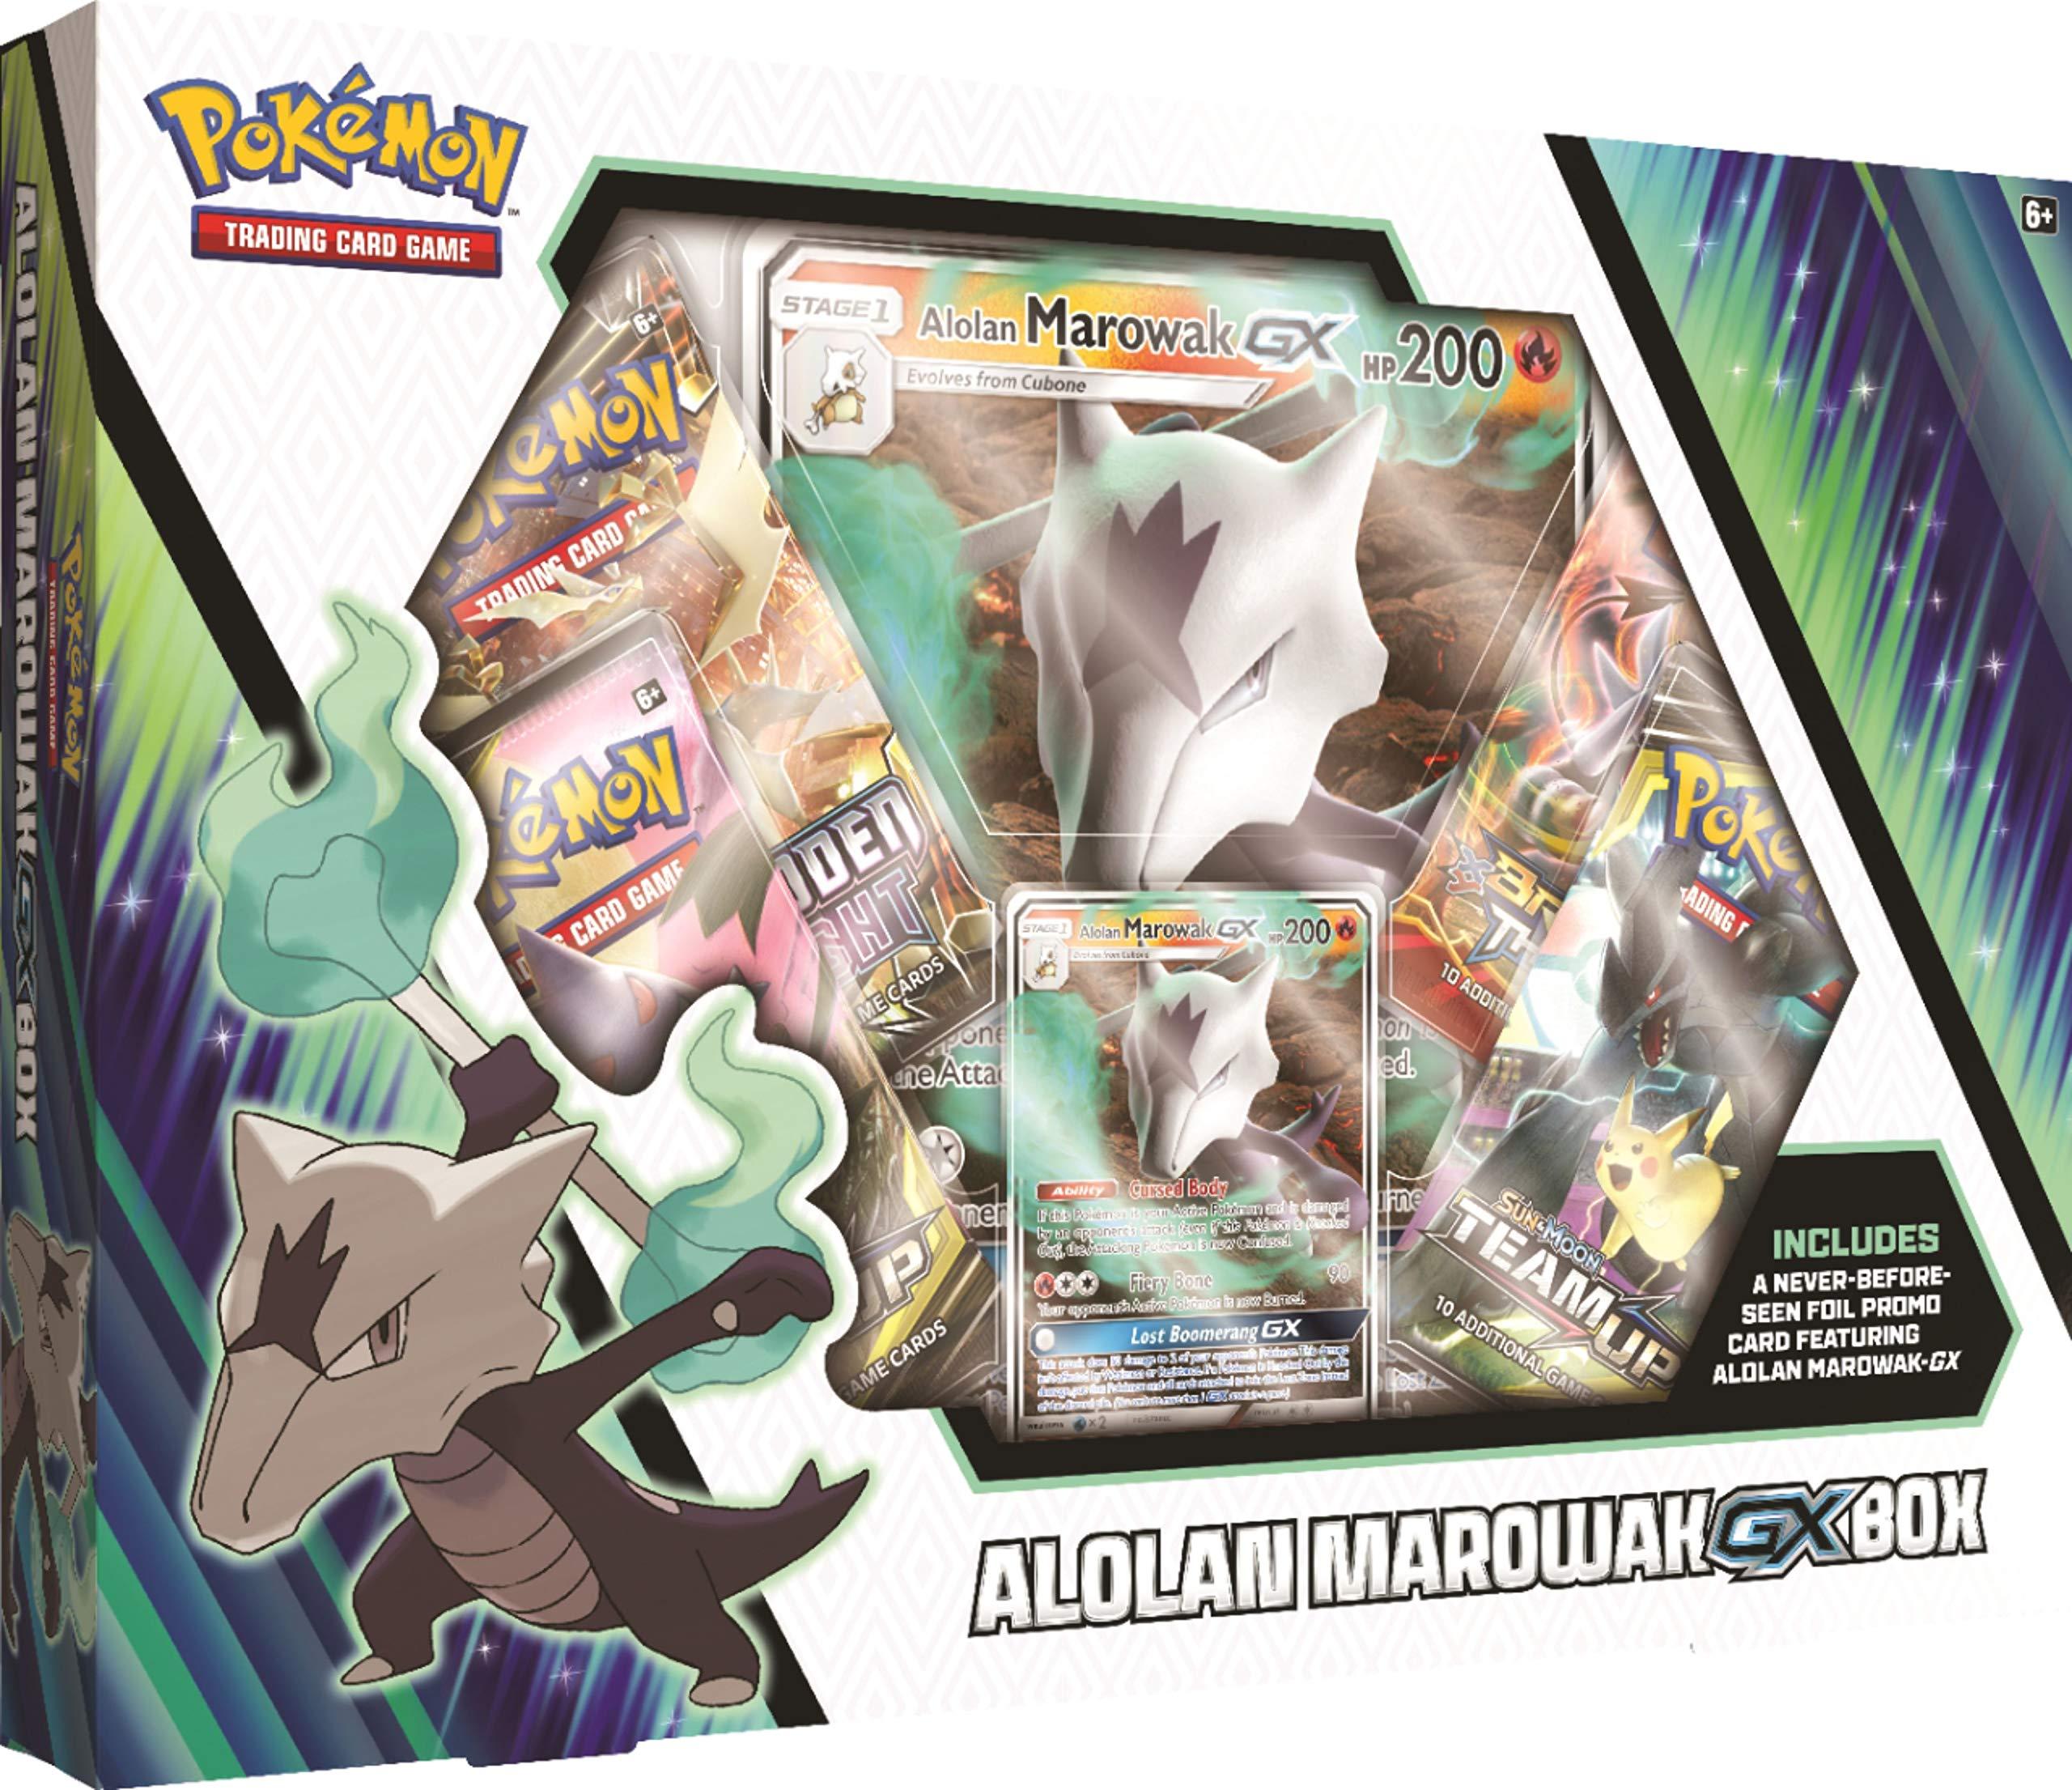 Pokemon Cards TCG: Alolan Marowak-GxBox + 4 Booster Pack + A Foil Promo Card + A Foil Oversize Card by Pokemon Cards